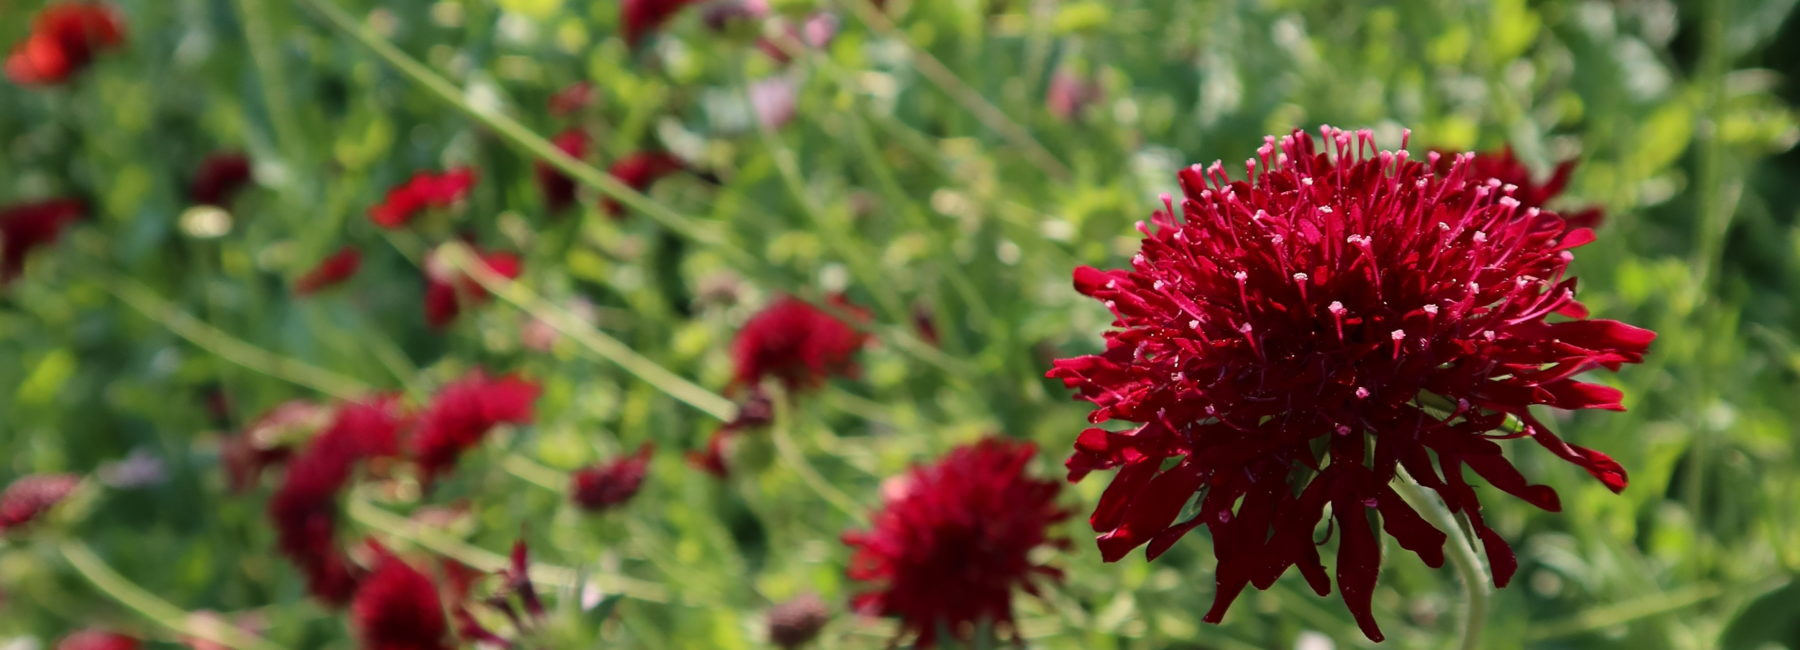 Dark red flower in greenery